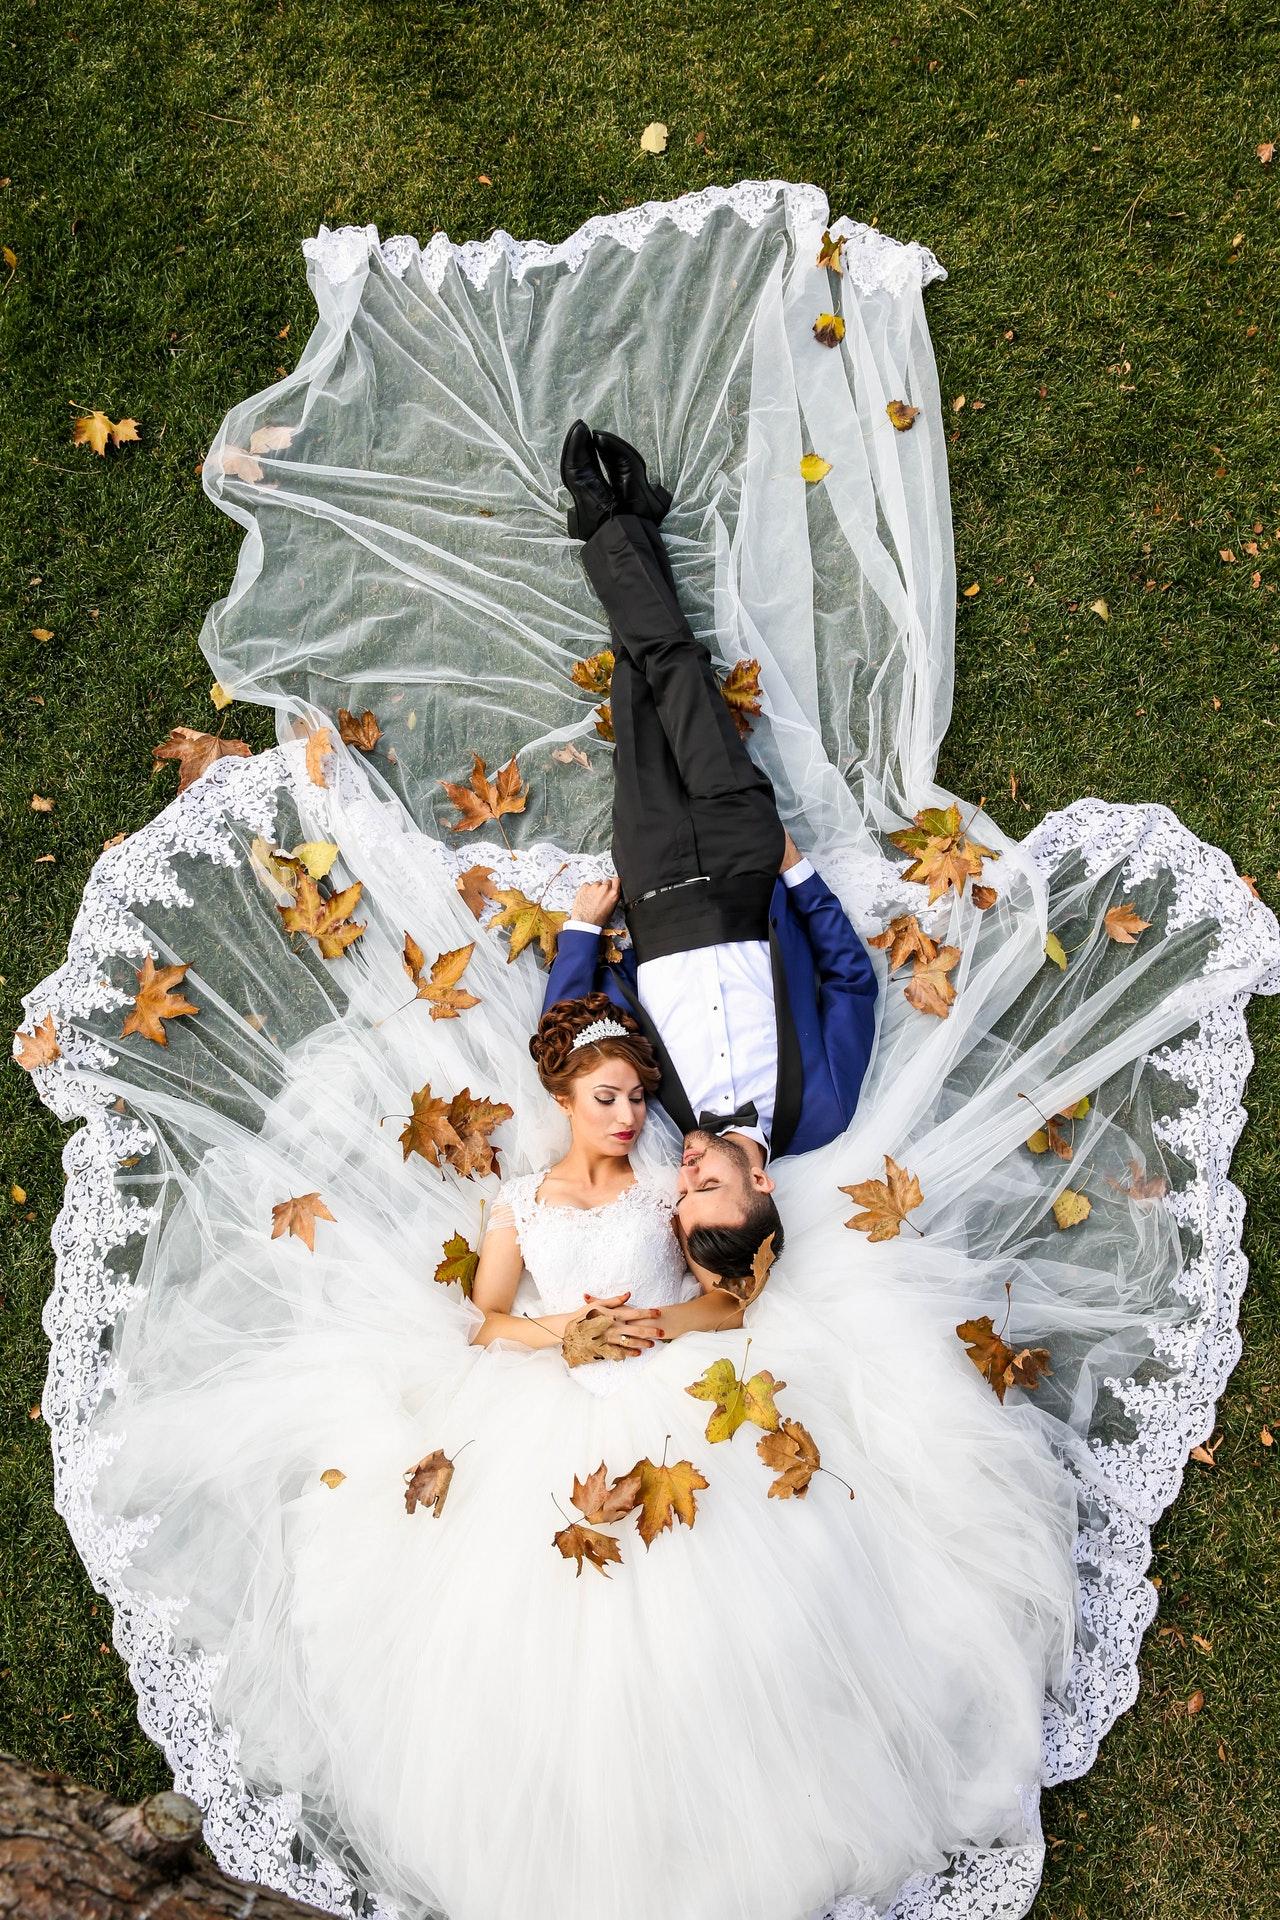 adult-bride-celebration-ceremony-265722